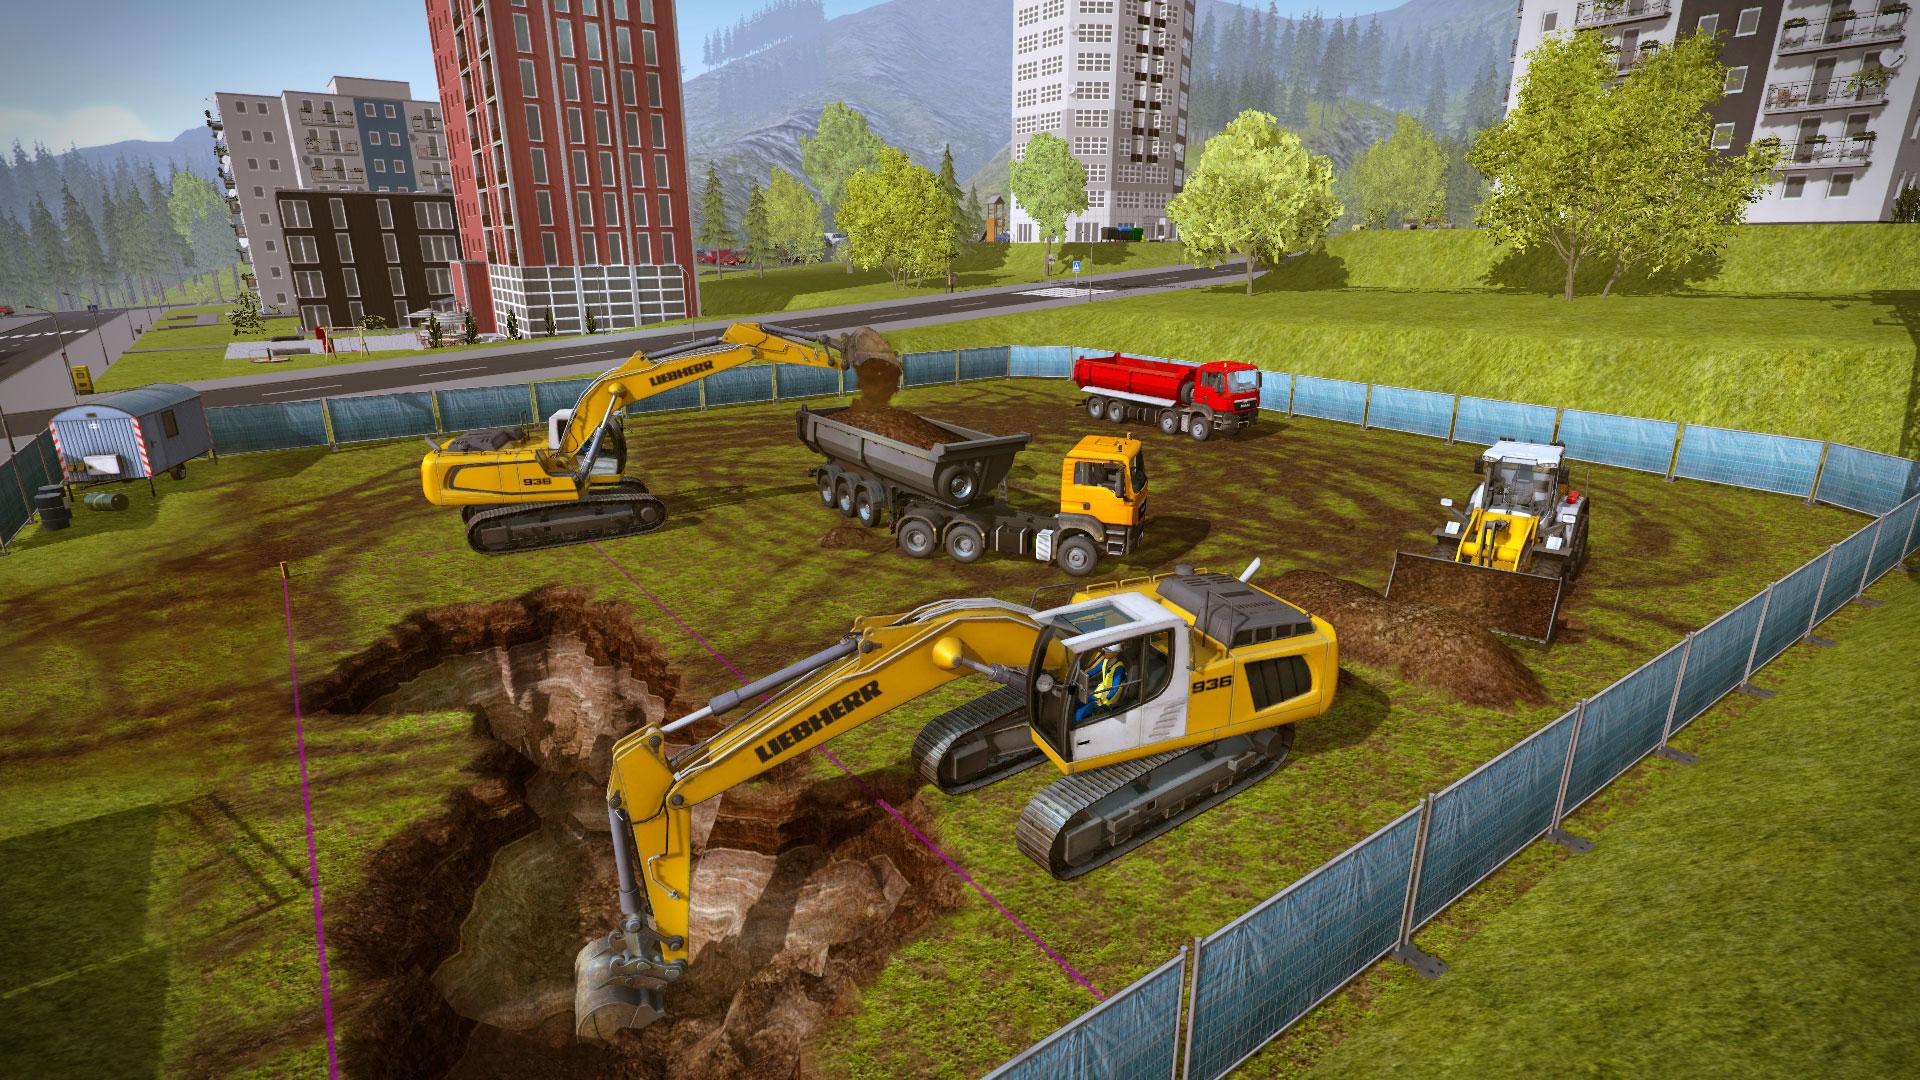 Construction Simulator 2015: Vertical Skyline on Steam